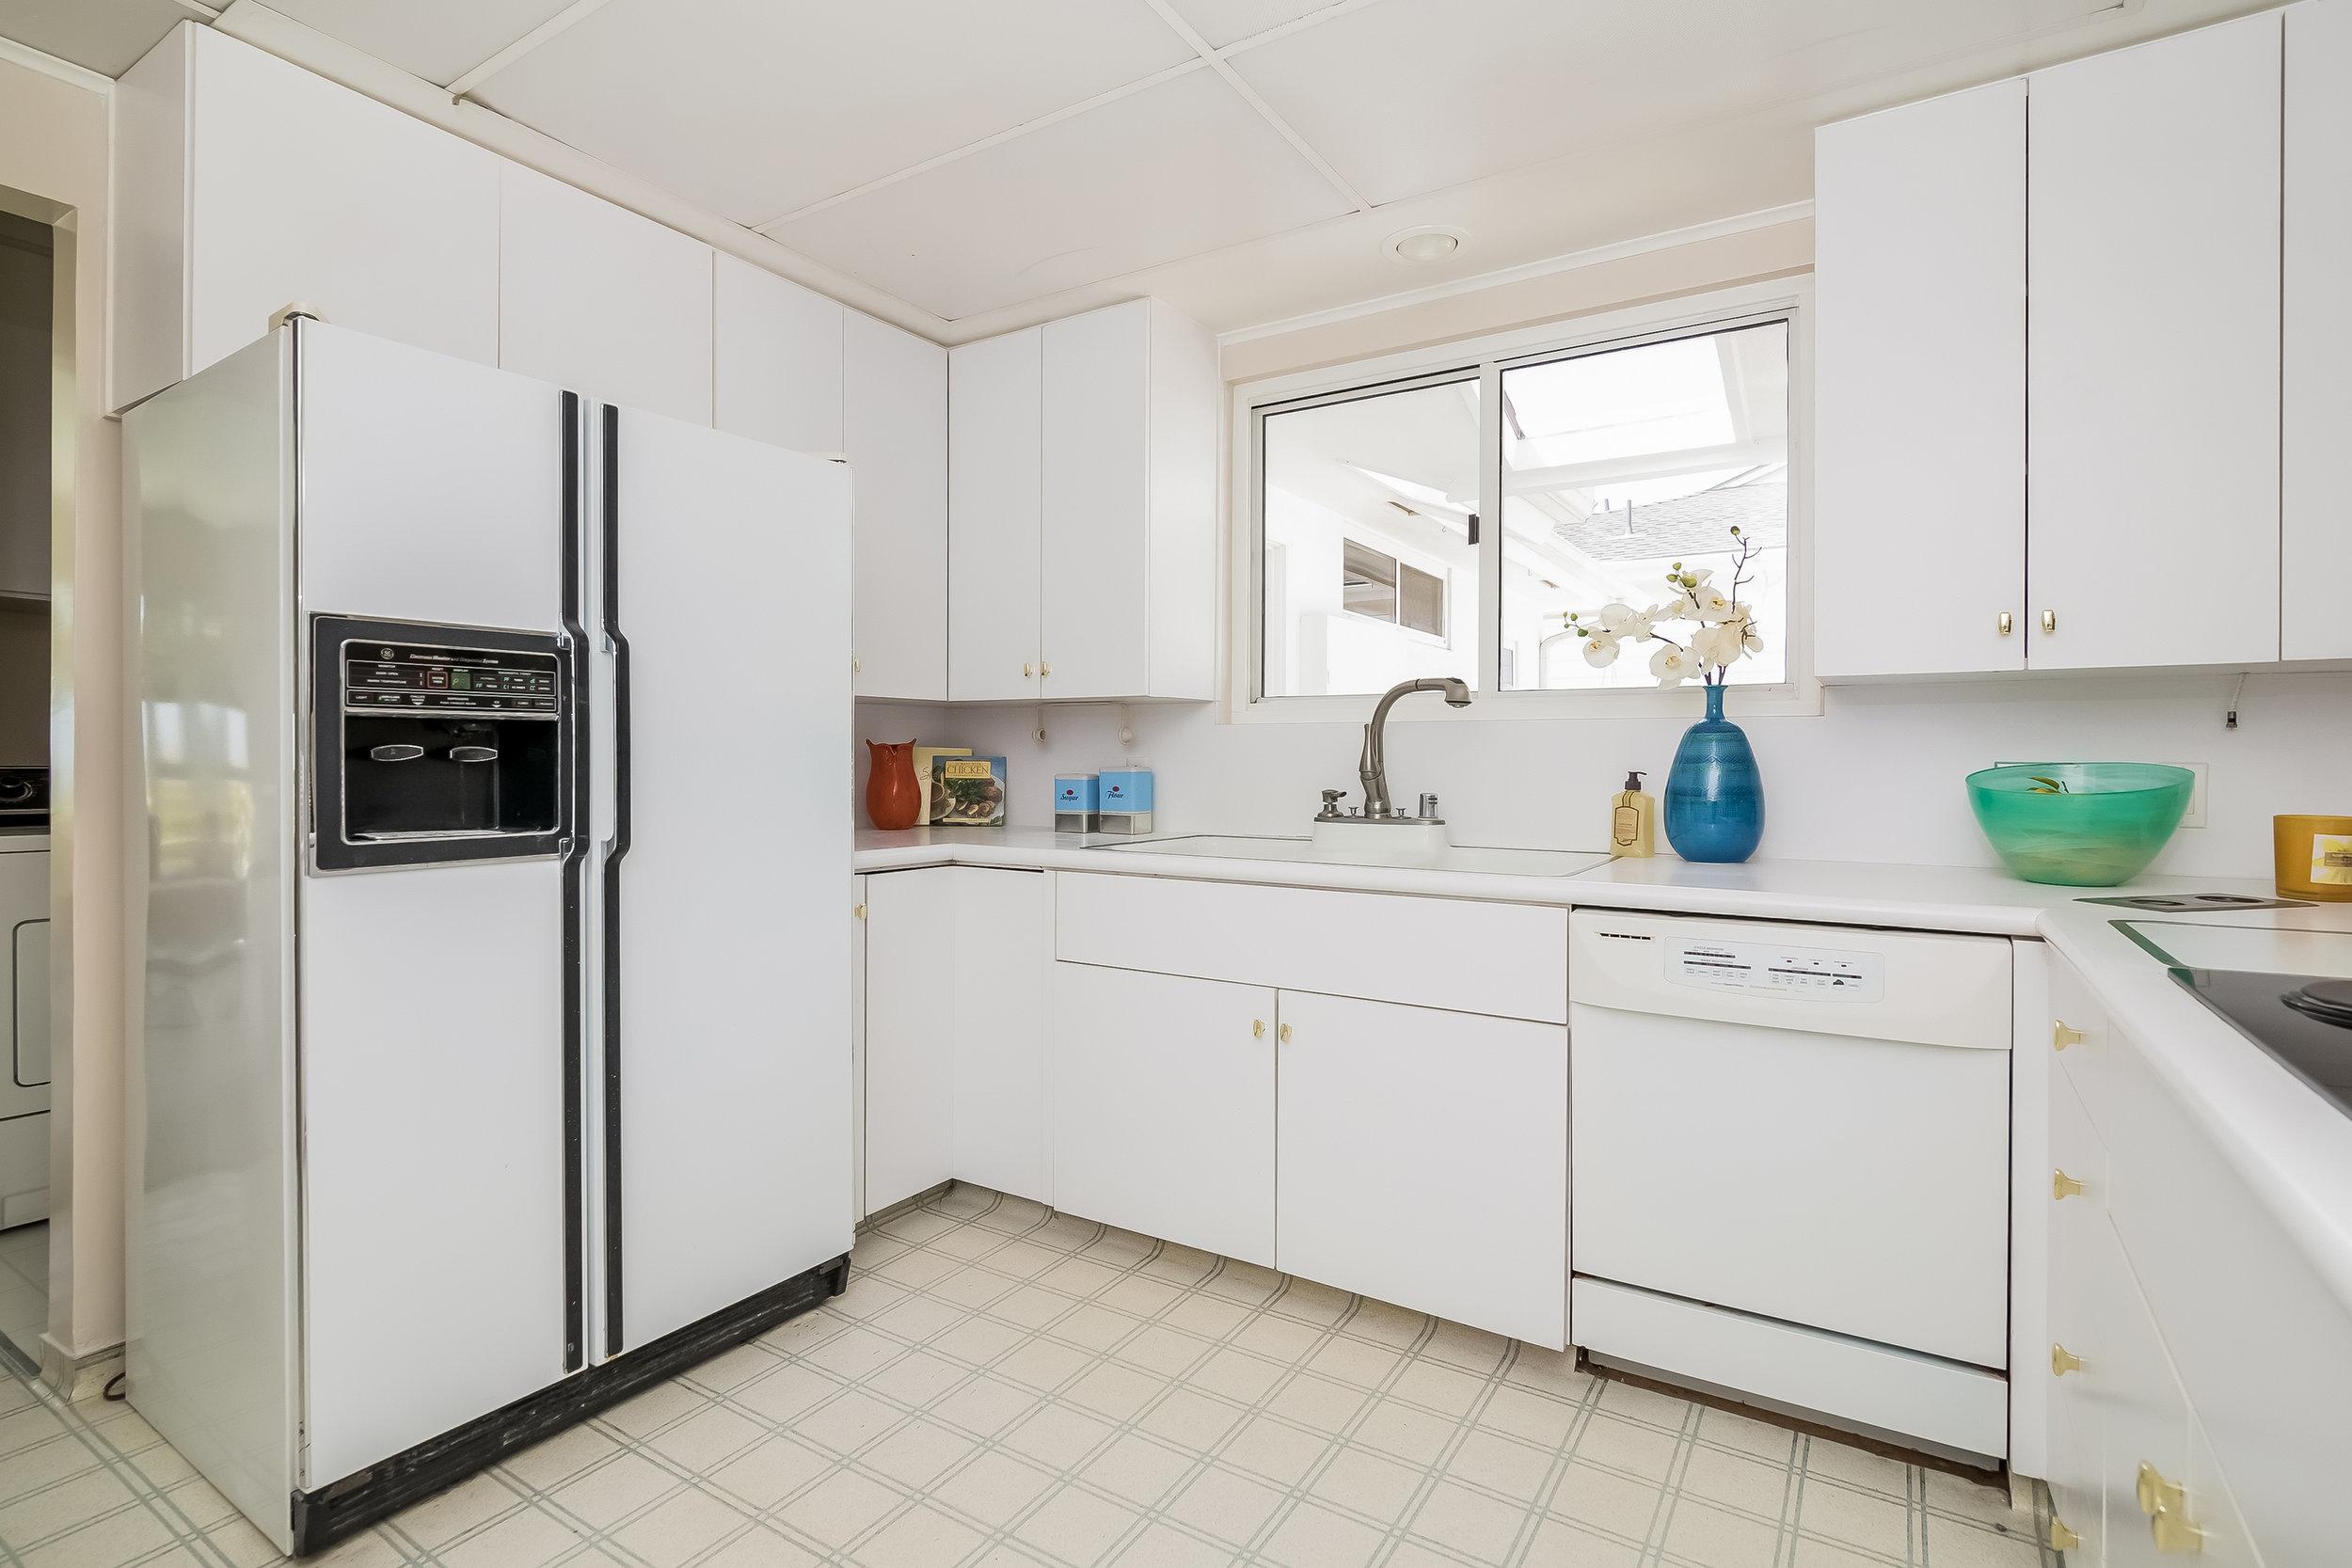 017-Kitchen-2805294-large copy.jpg